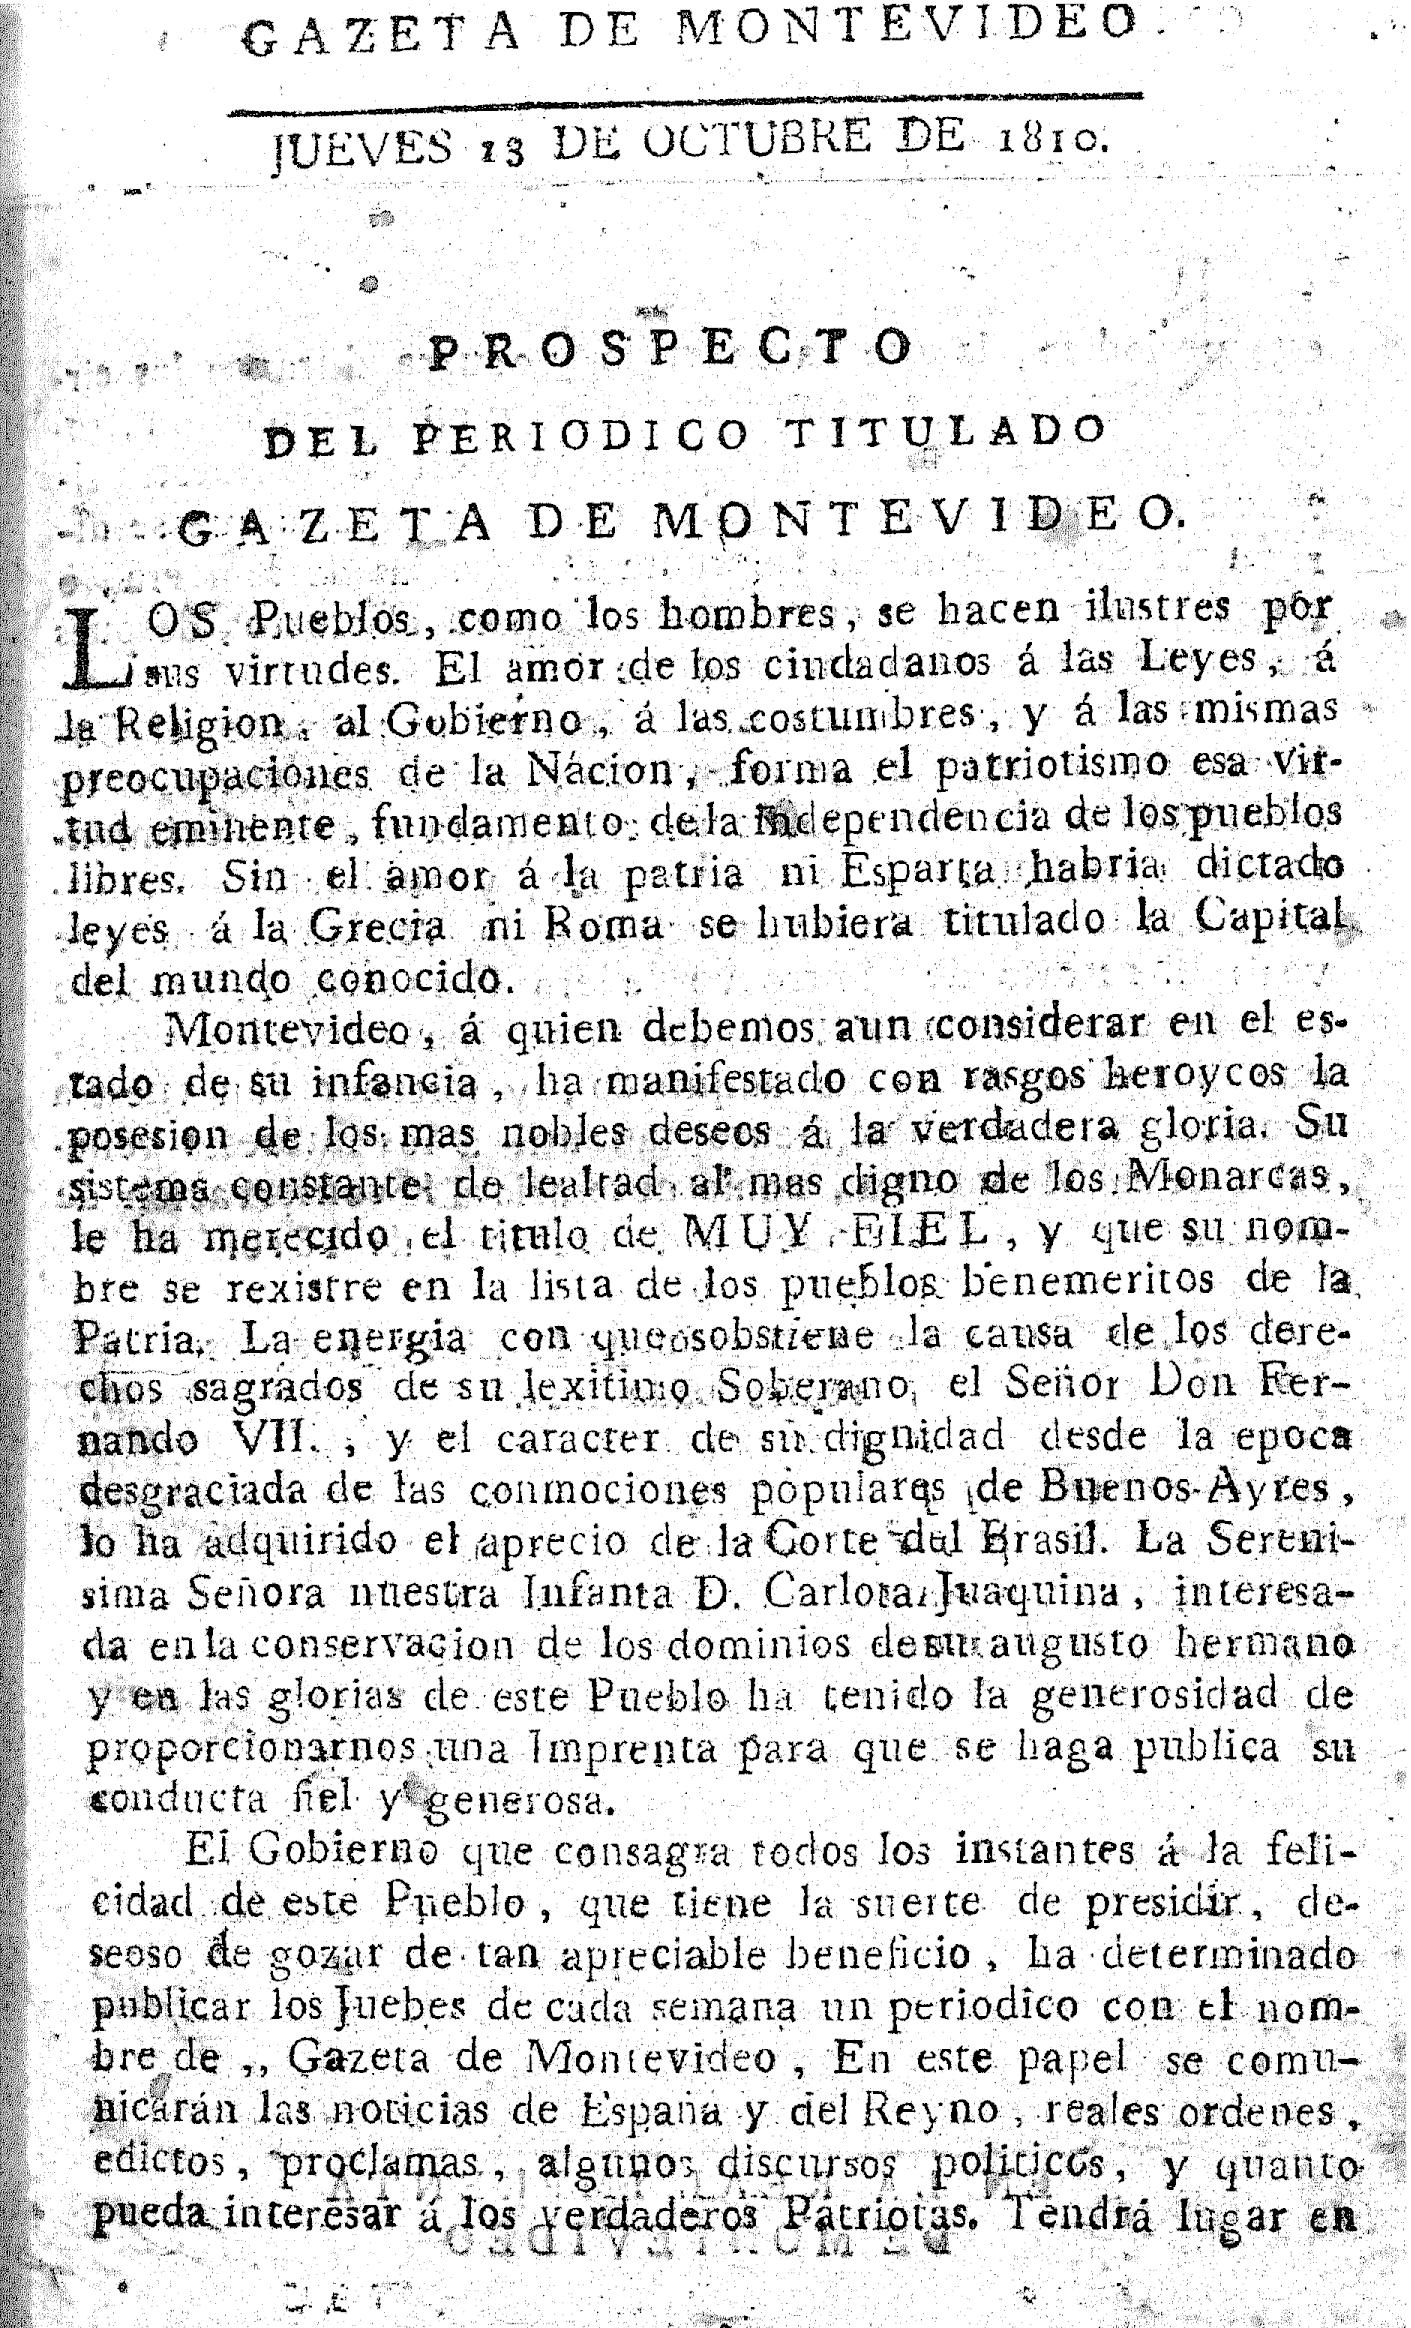 3. Gazeta de Montevideo (1810).png